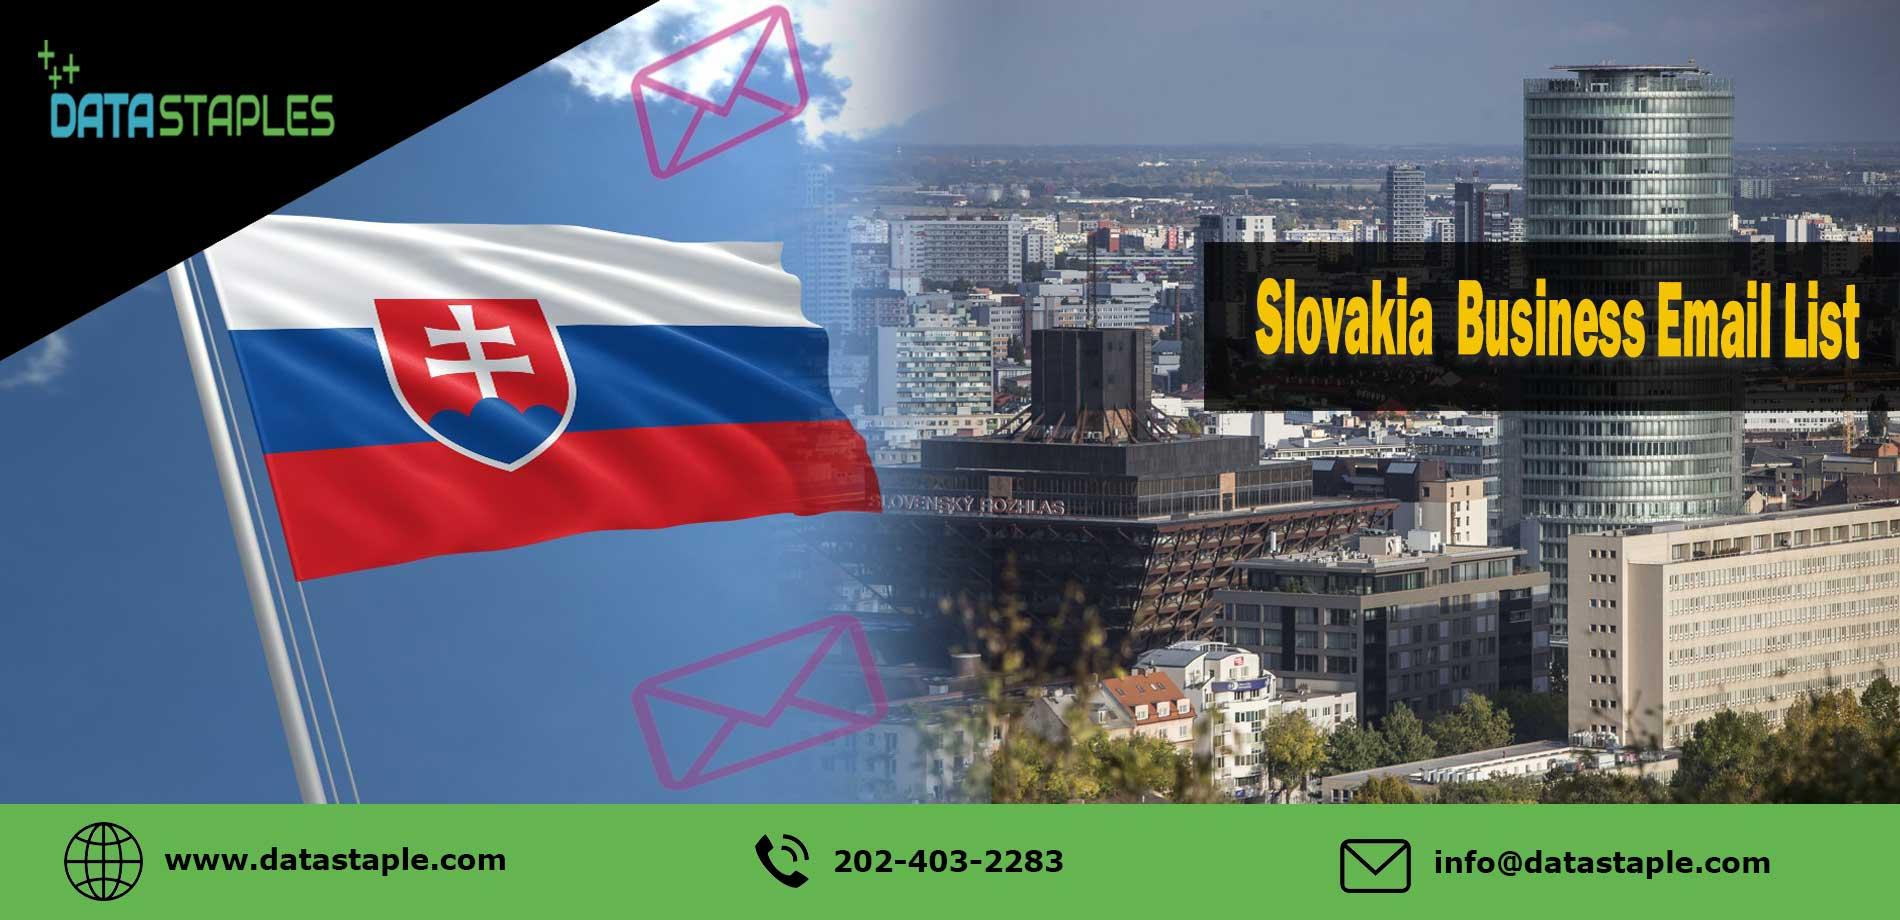 Slovakia Business Email List | DataStaples